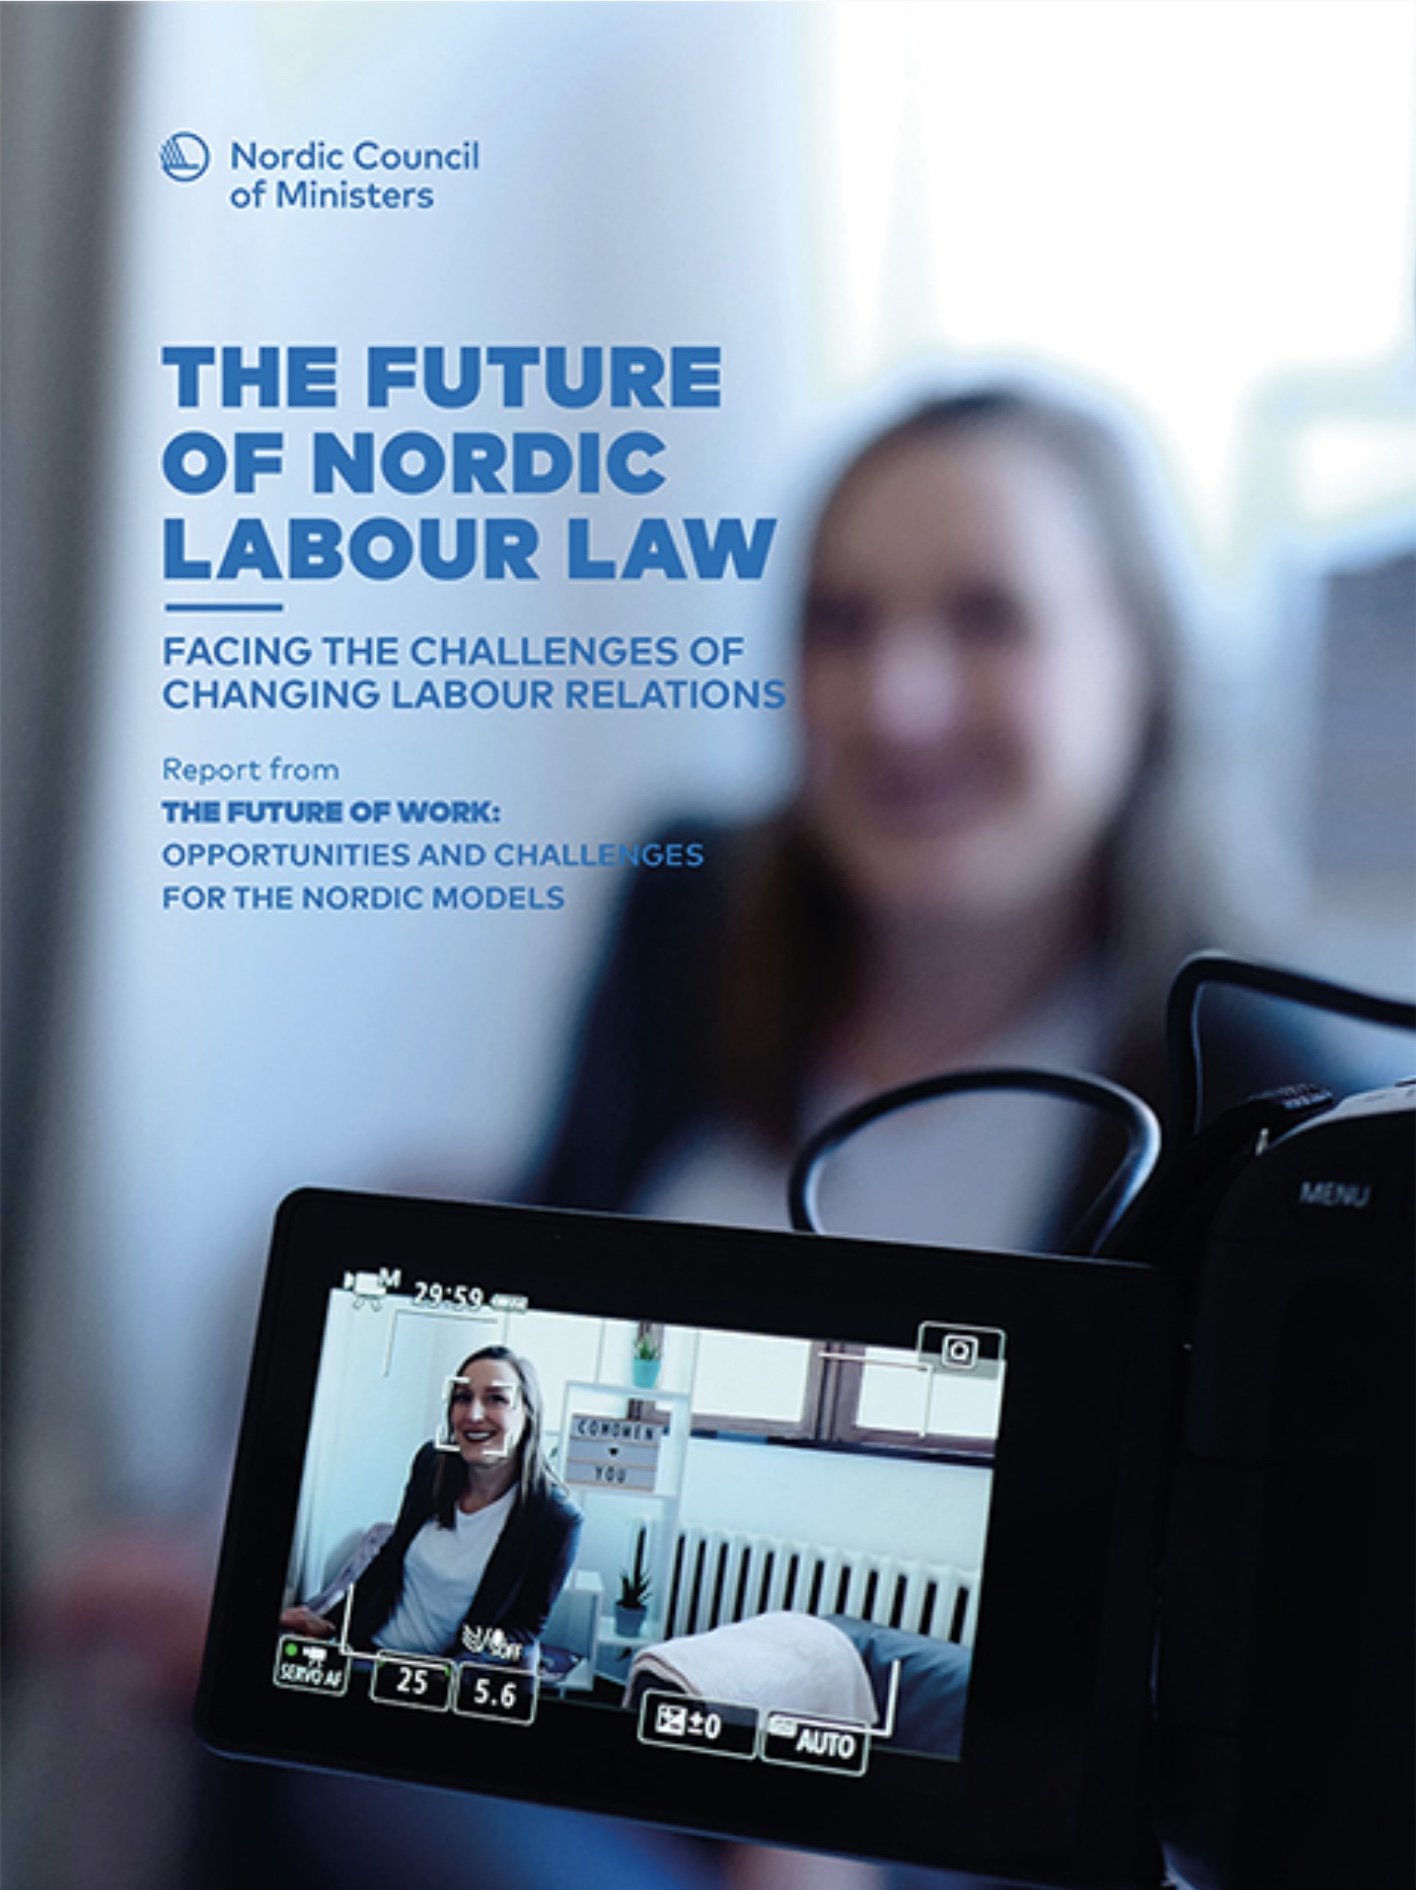 The Future of Nordic Labour Law